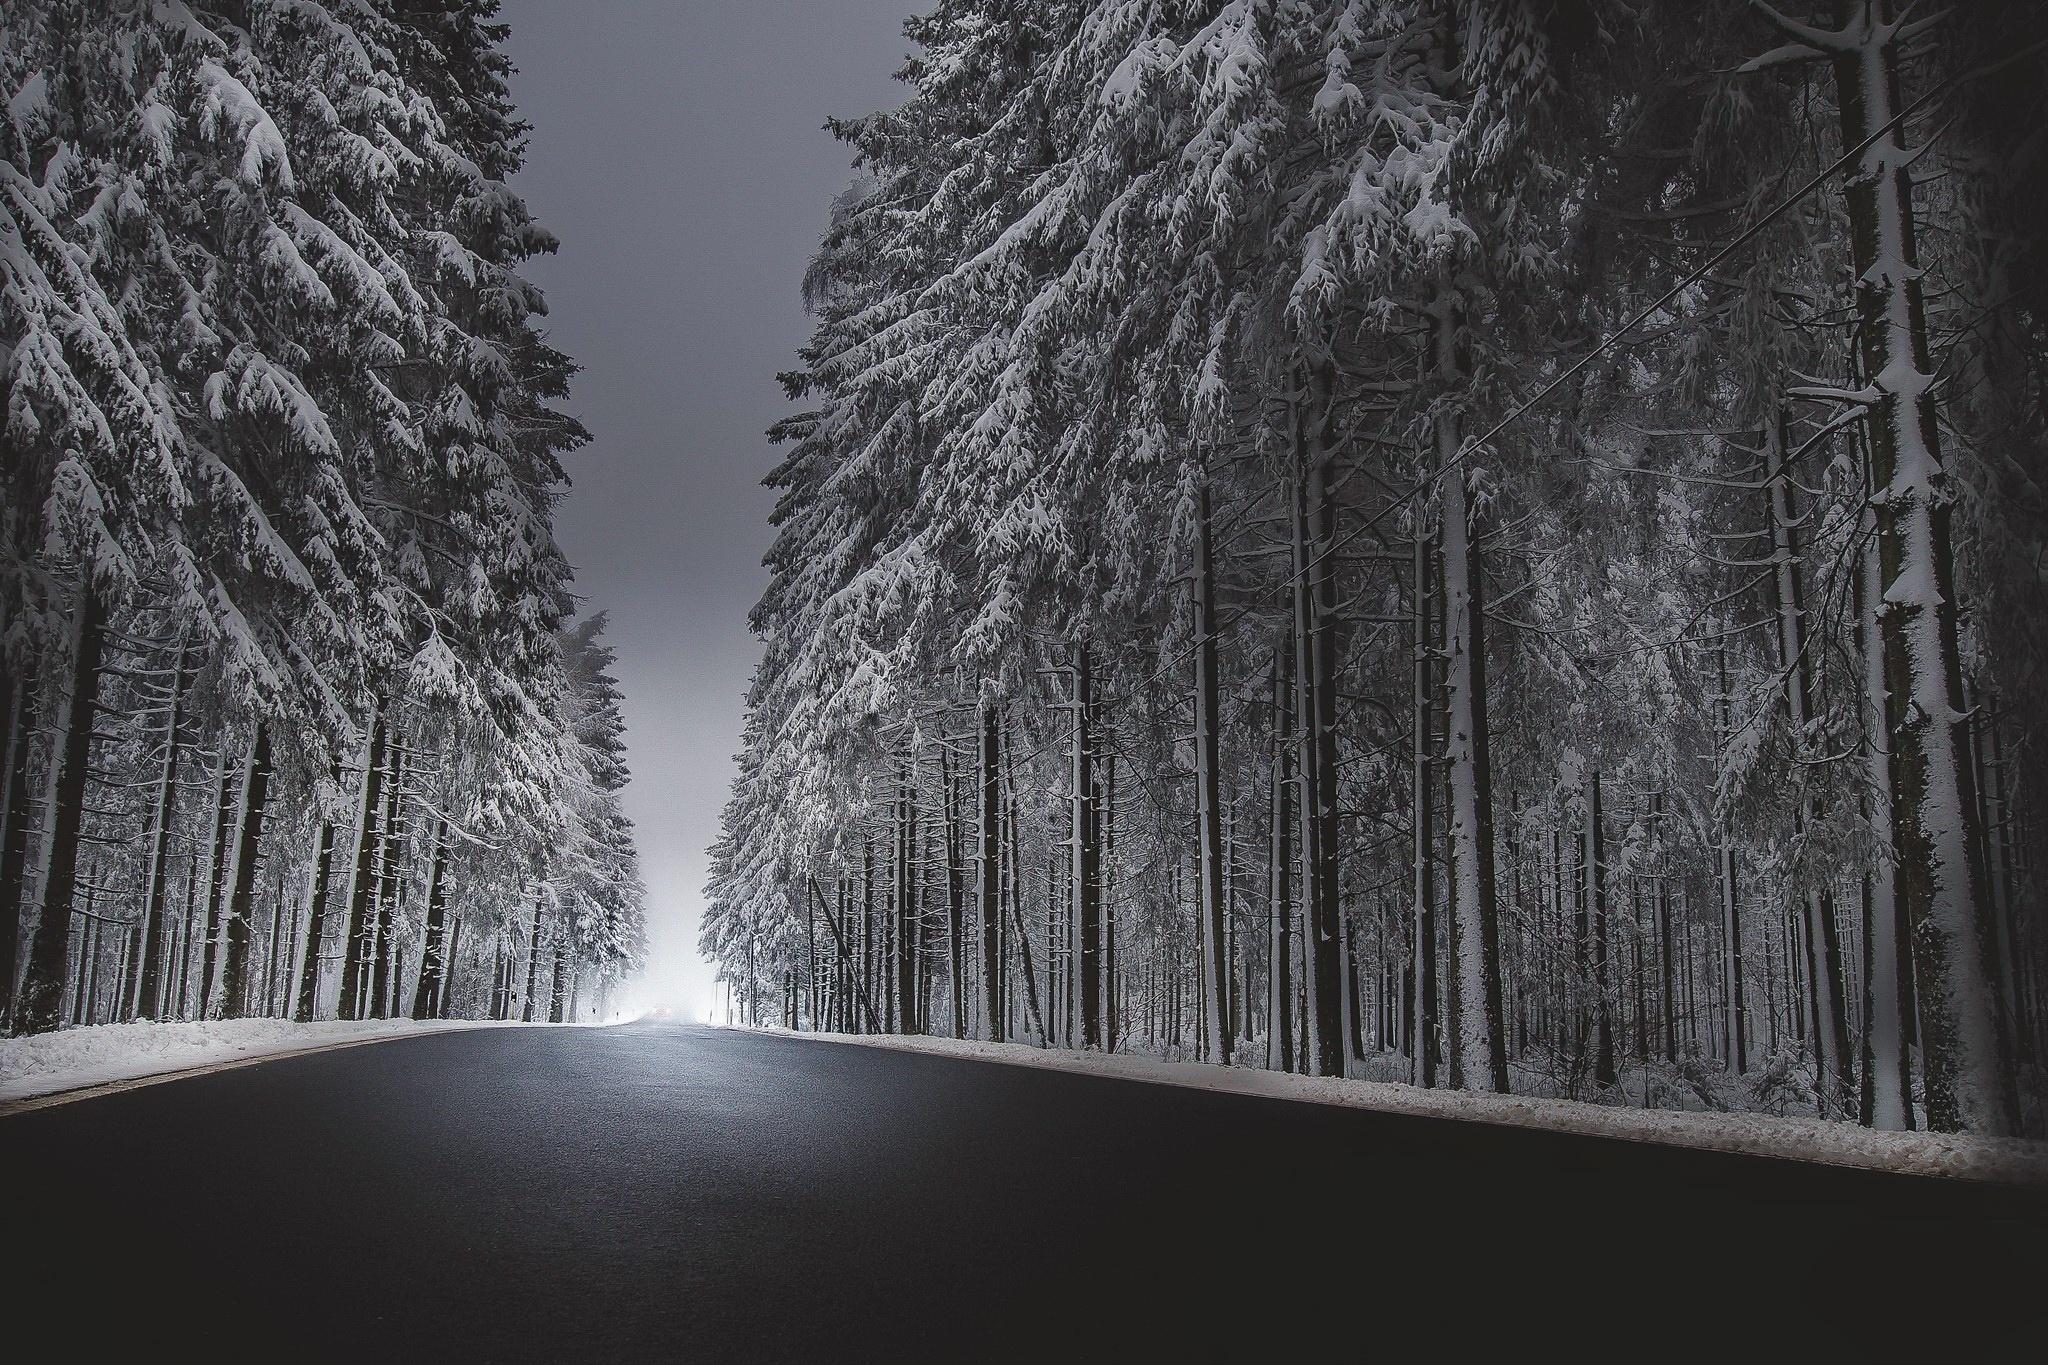 winter road asphalt snow 1574939653 - Winter Road Asphalt Snow -